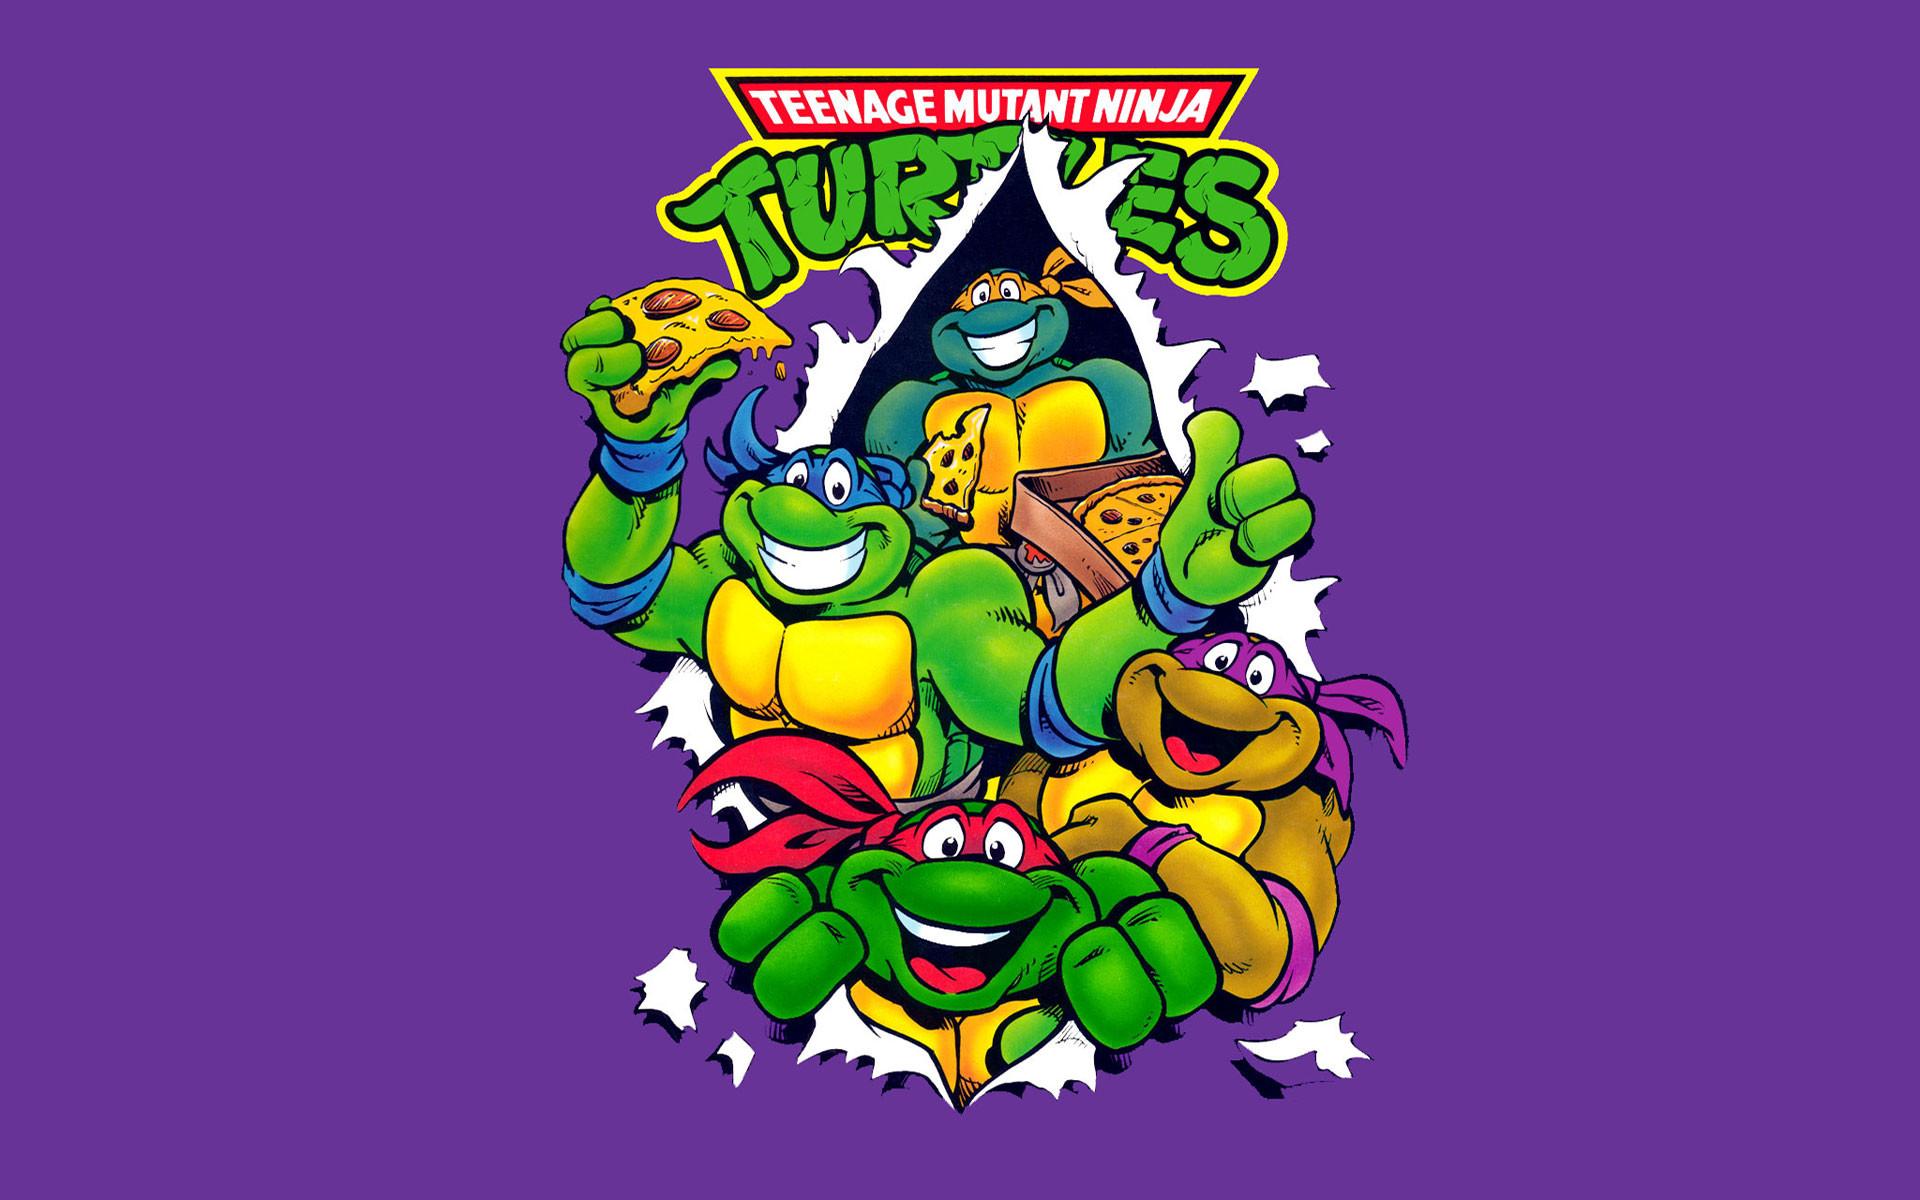 Teenage Mutant Ninja Turtles Wallpaper – Free Android Application … |  Download Wallpaper | Pinterest | Ninja turtles pictures